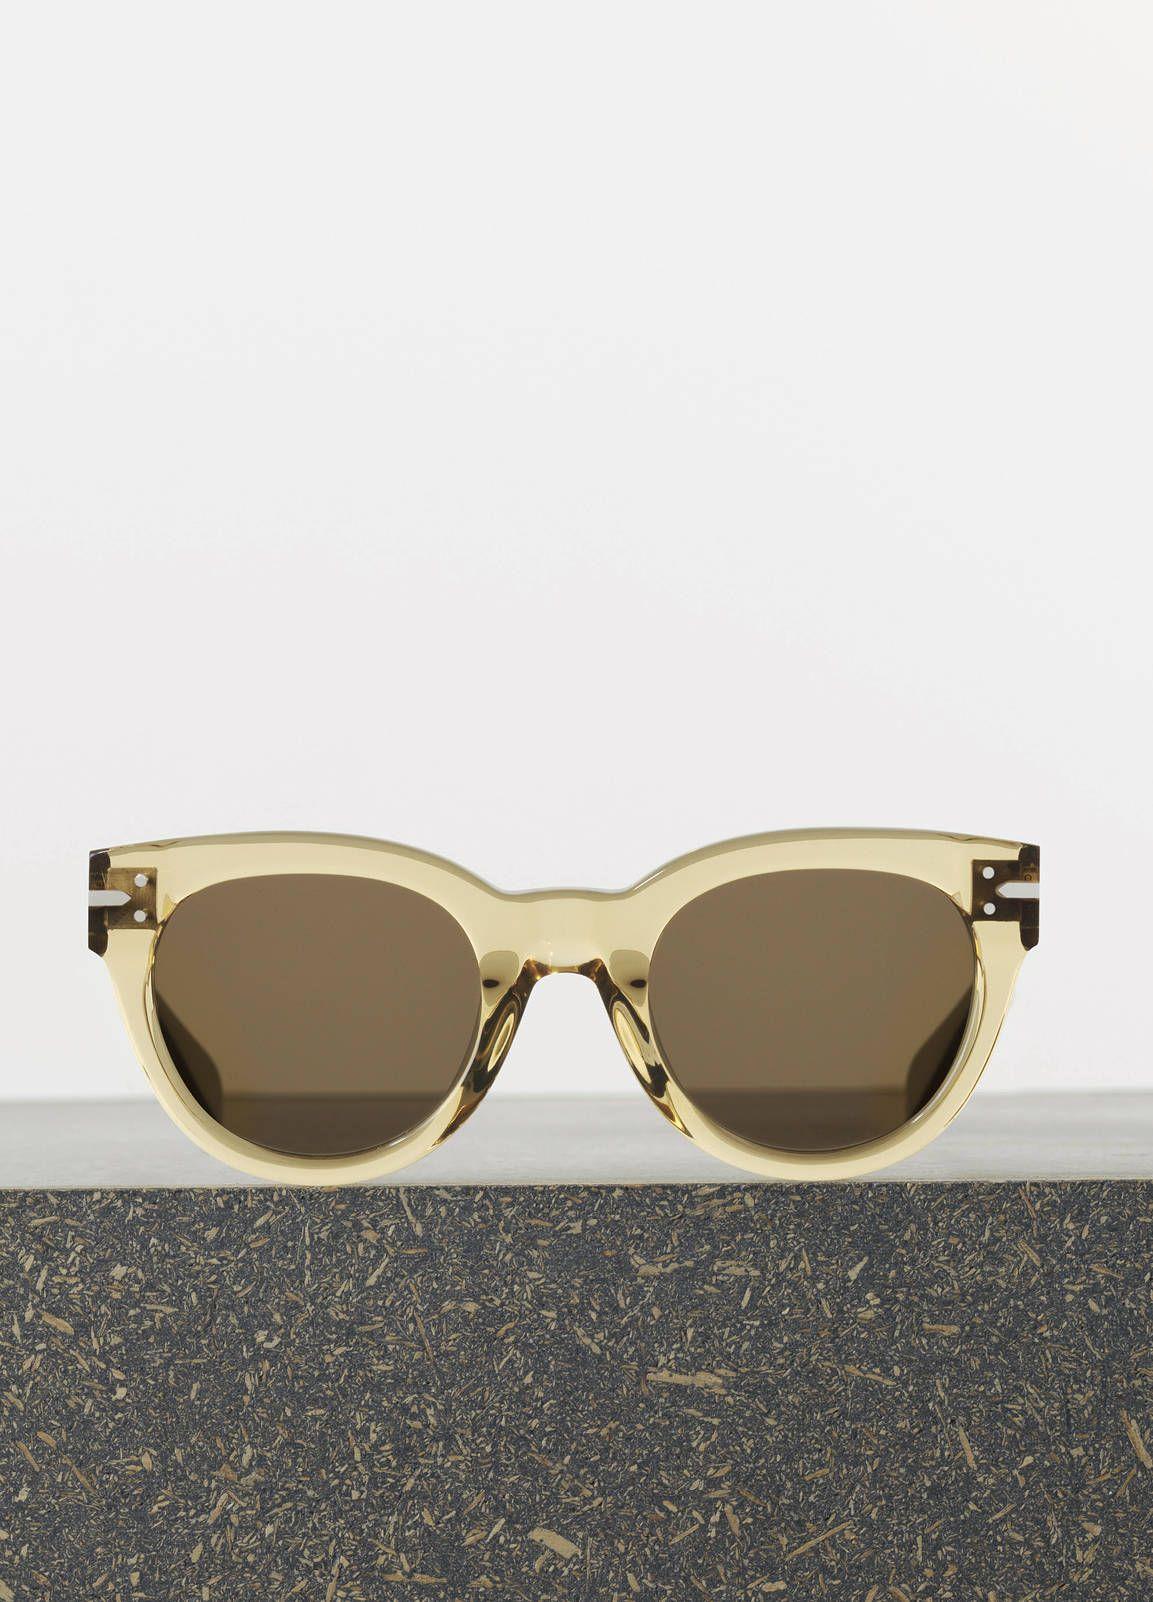 4dfb917ab3b3 Céline New Butterfly Sunglasses in Transparent Saffron Acetate with Brown  Lenses